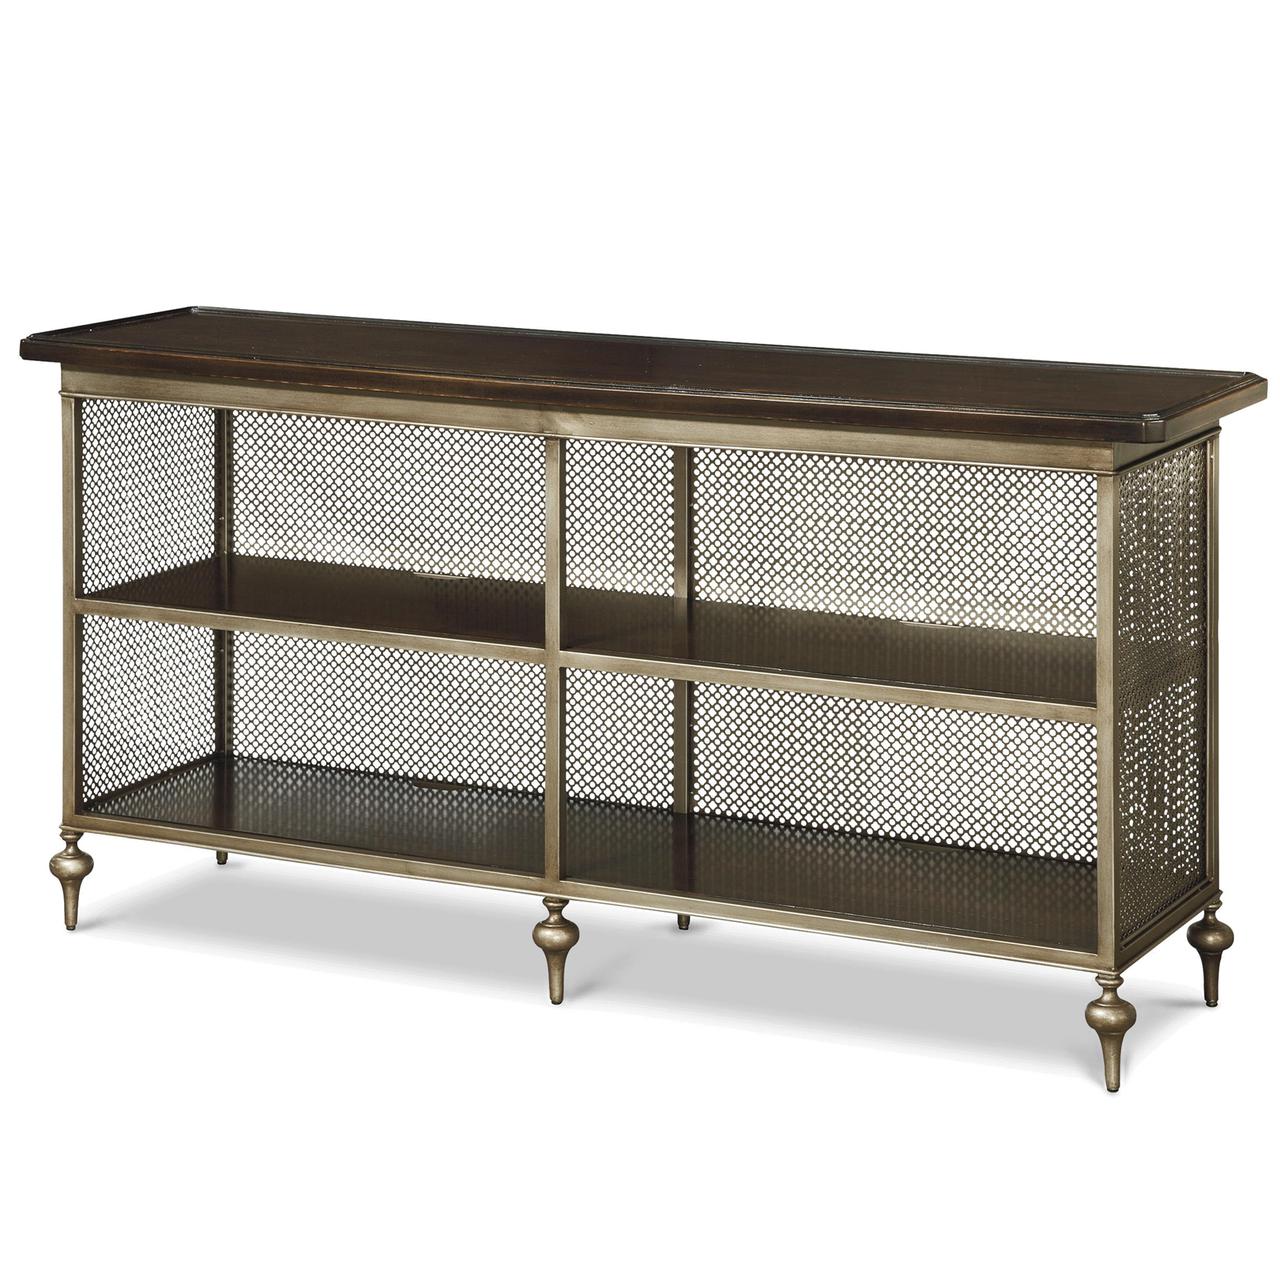 Rollins Industrial Loft Bronze Iron Console Table: Proximity Industrial Bronze Metal Console Table